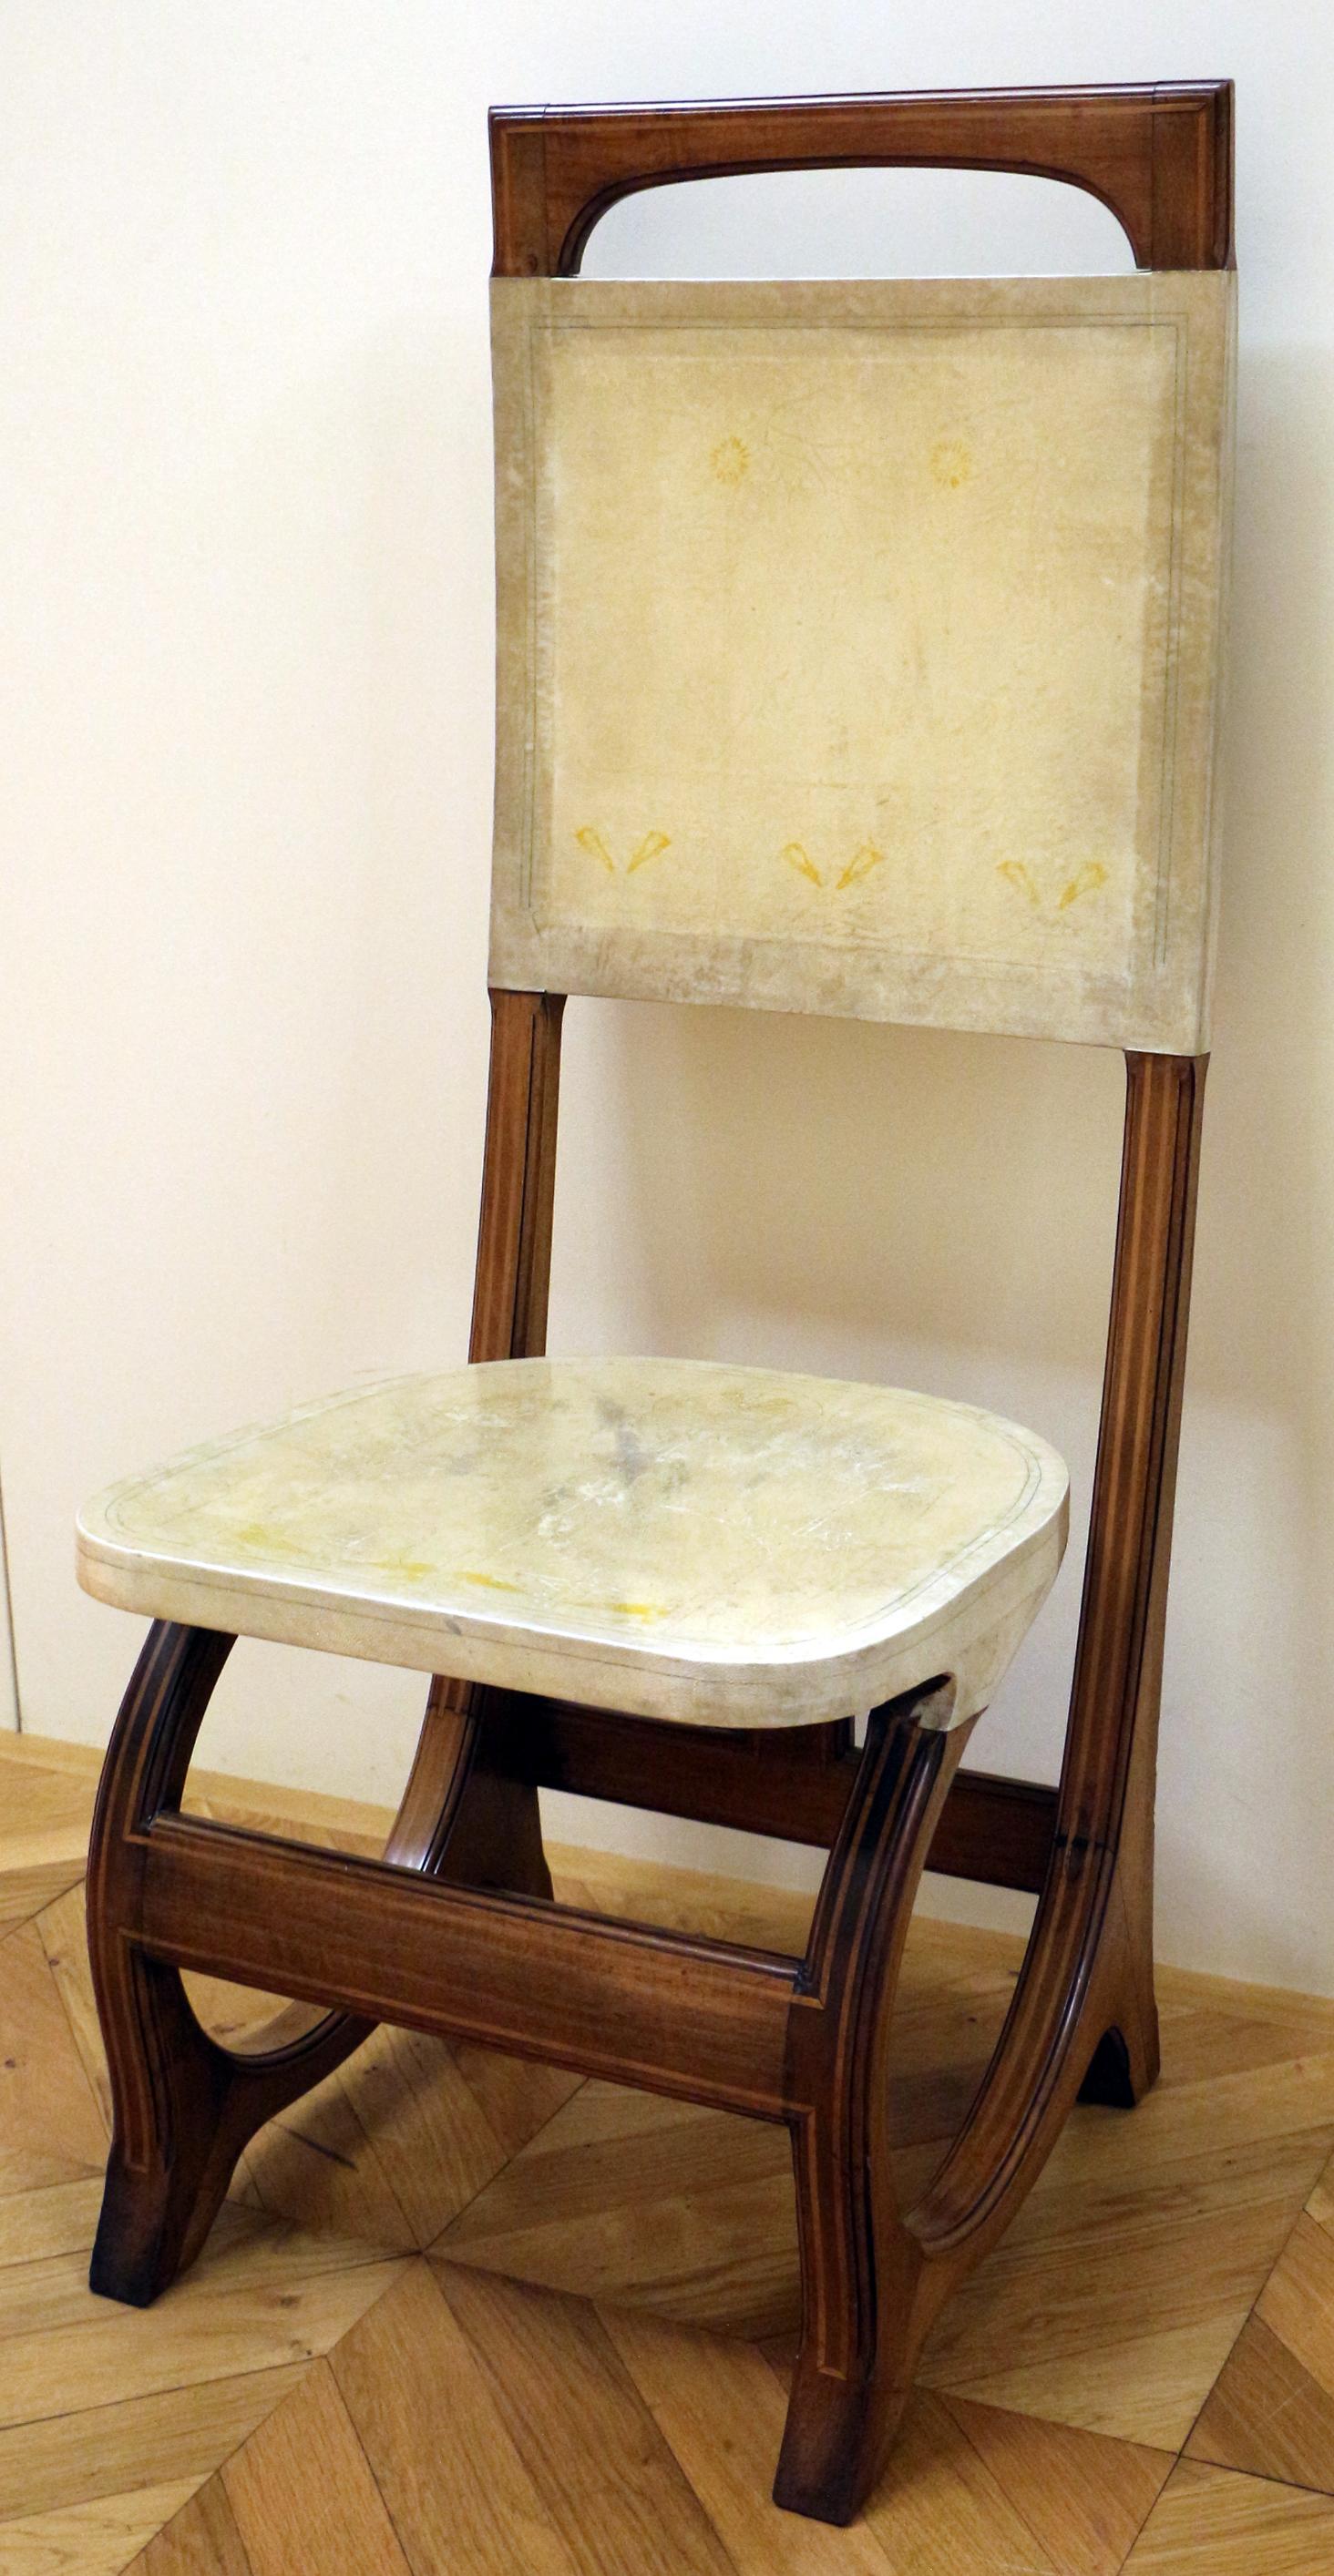 File carlo bugatti coppia di sedie da sala da pranzo for Sedie da sala pranzo